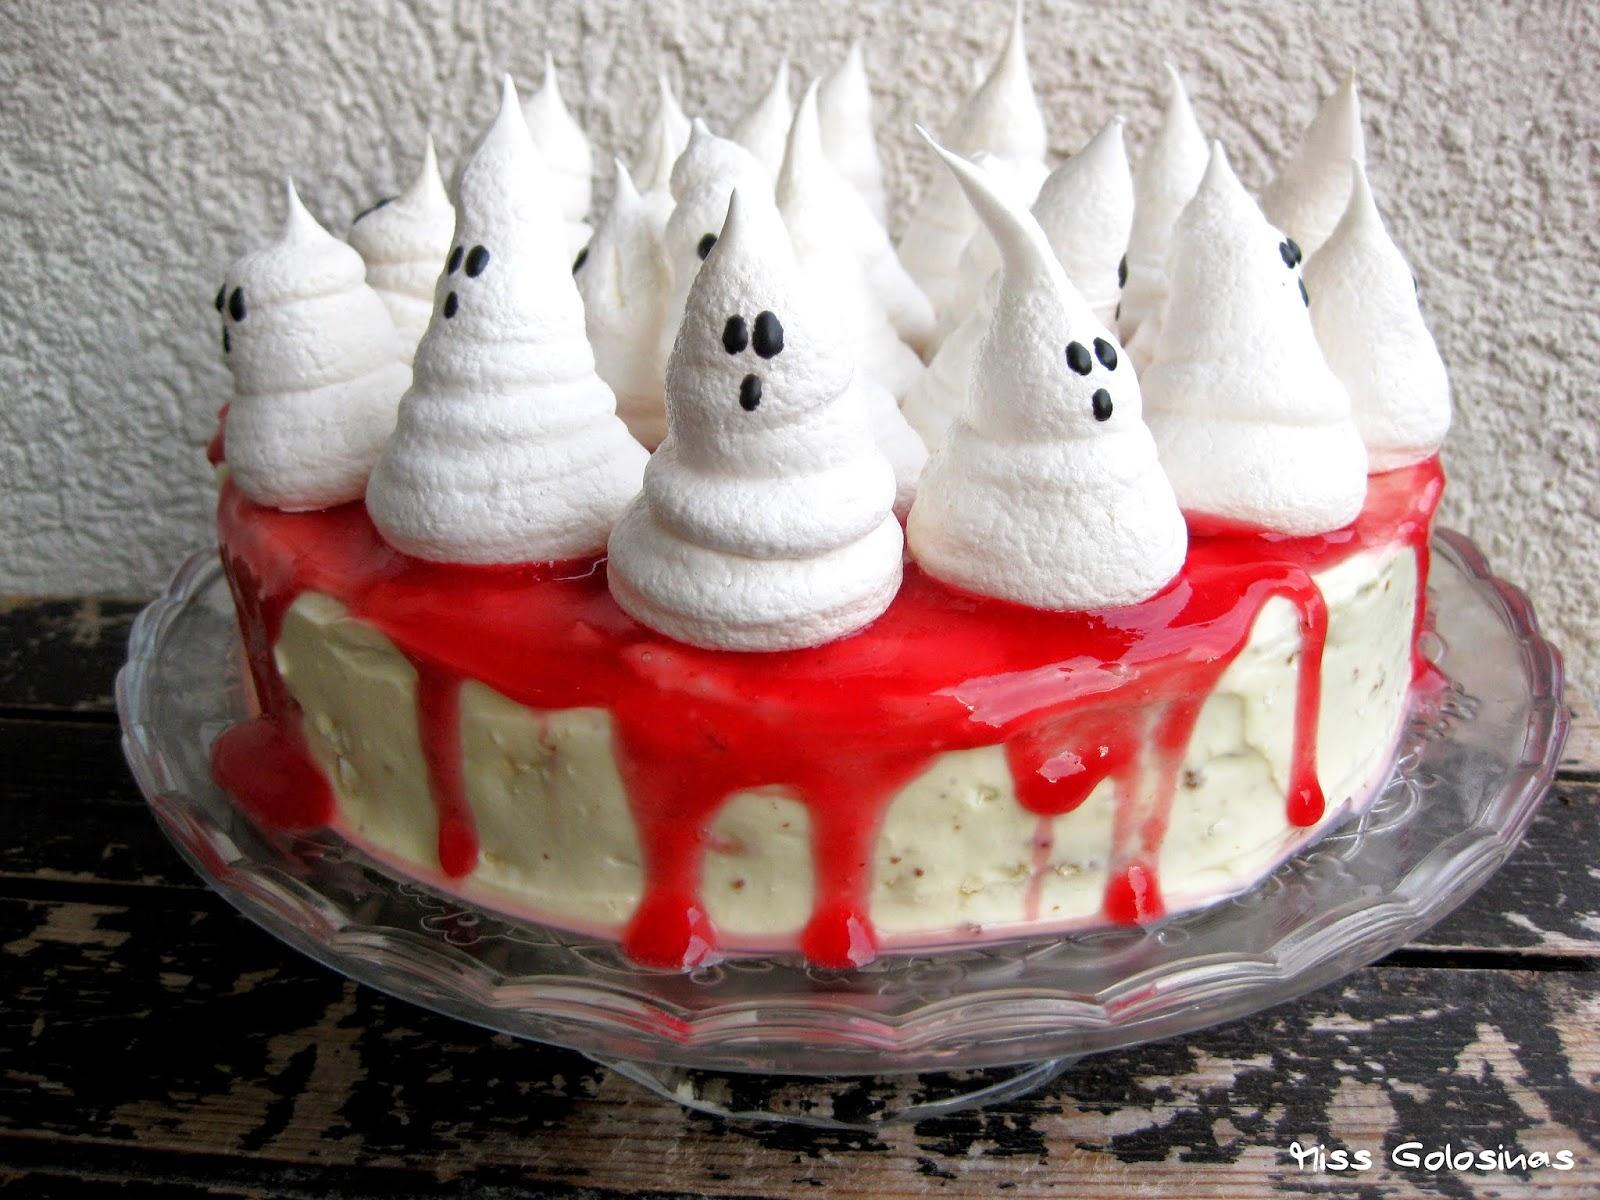 Geistertorte, ghost cake,